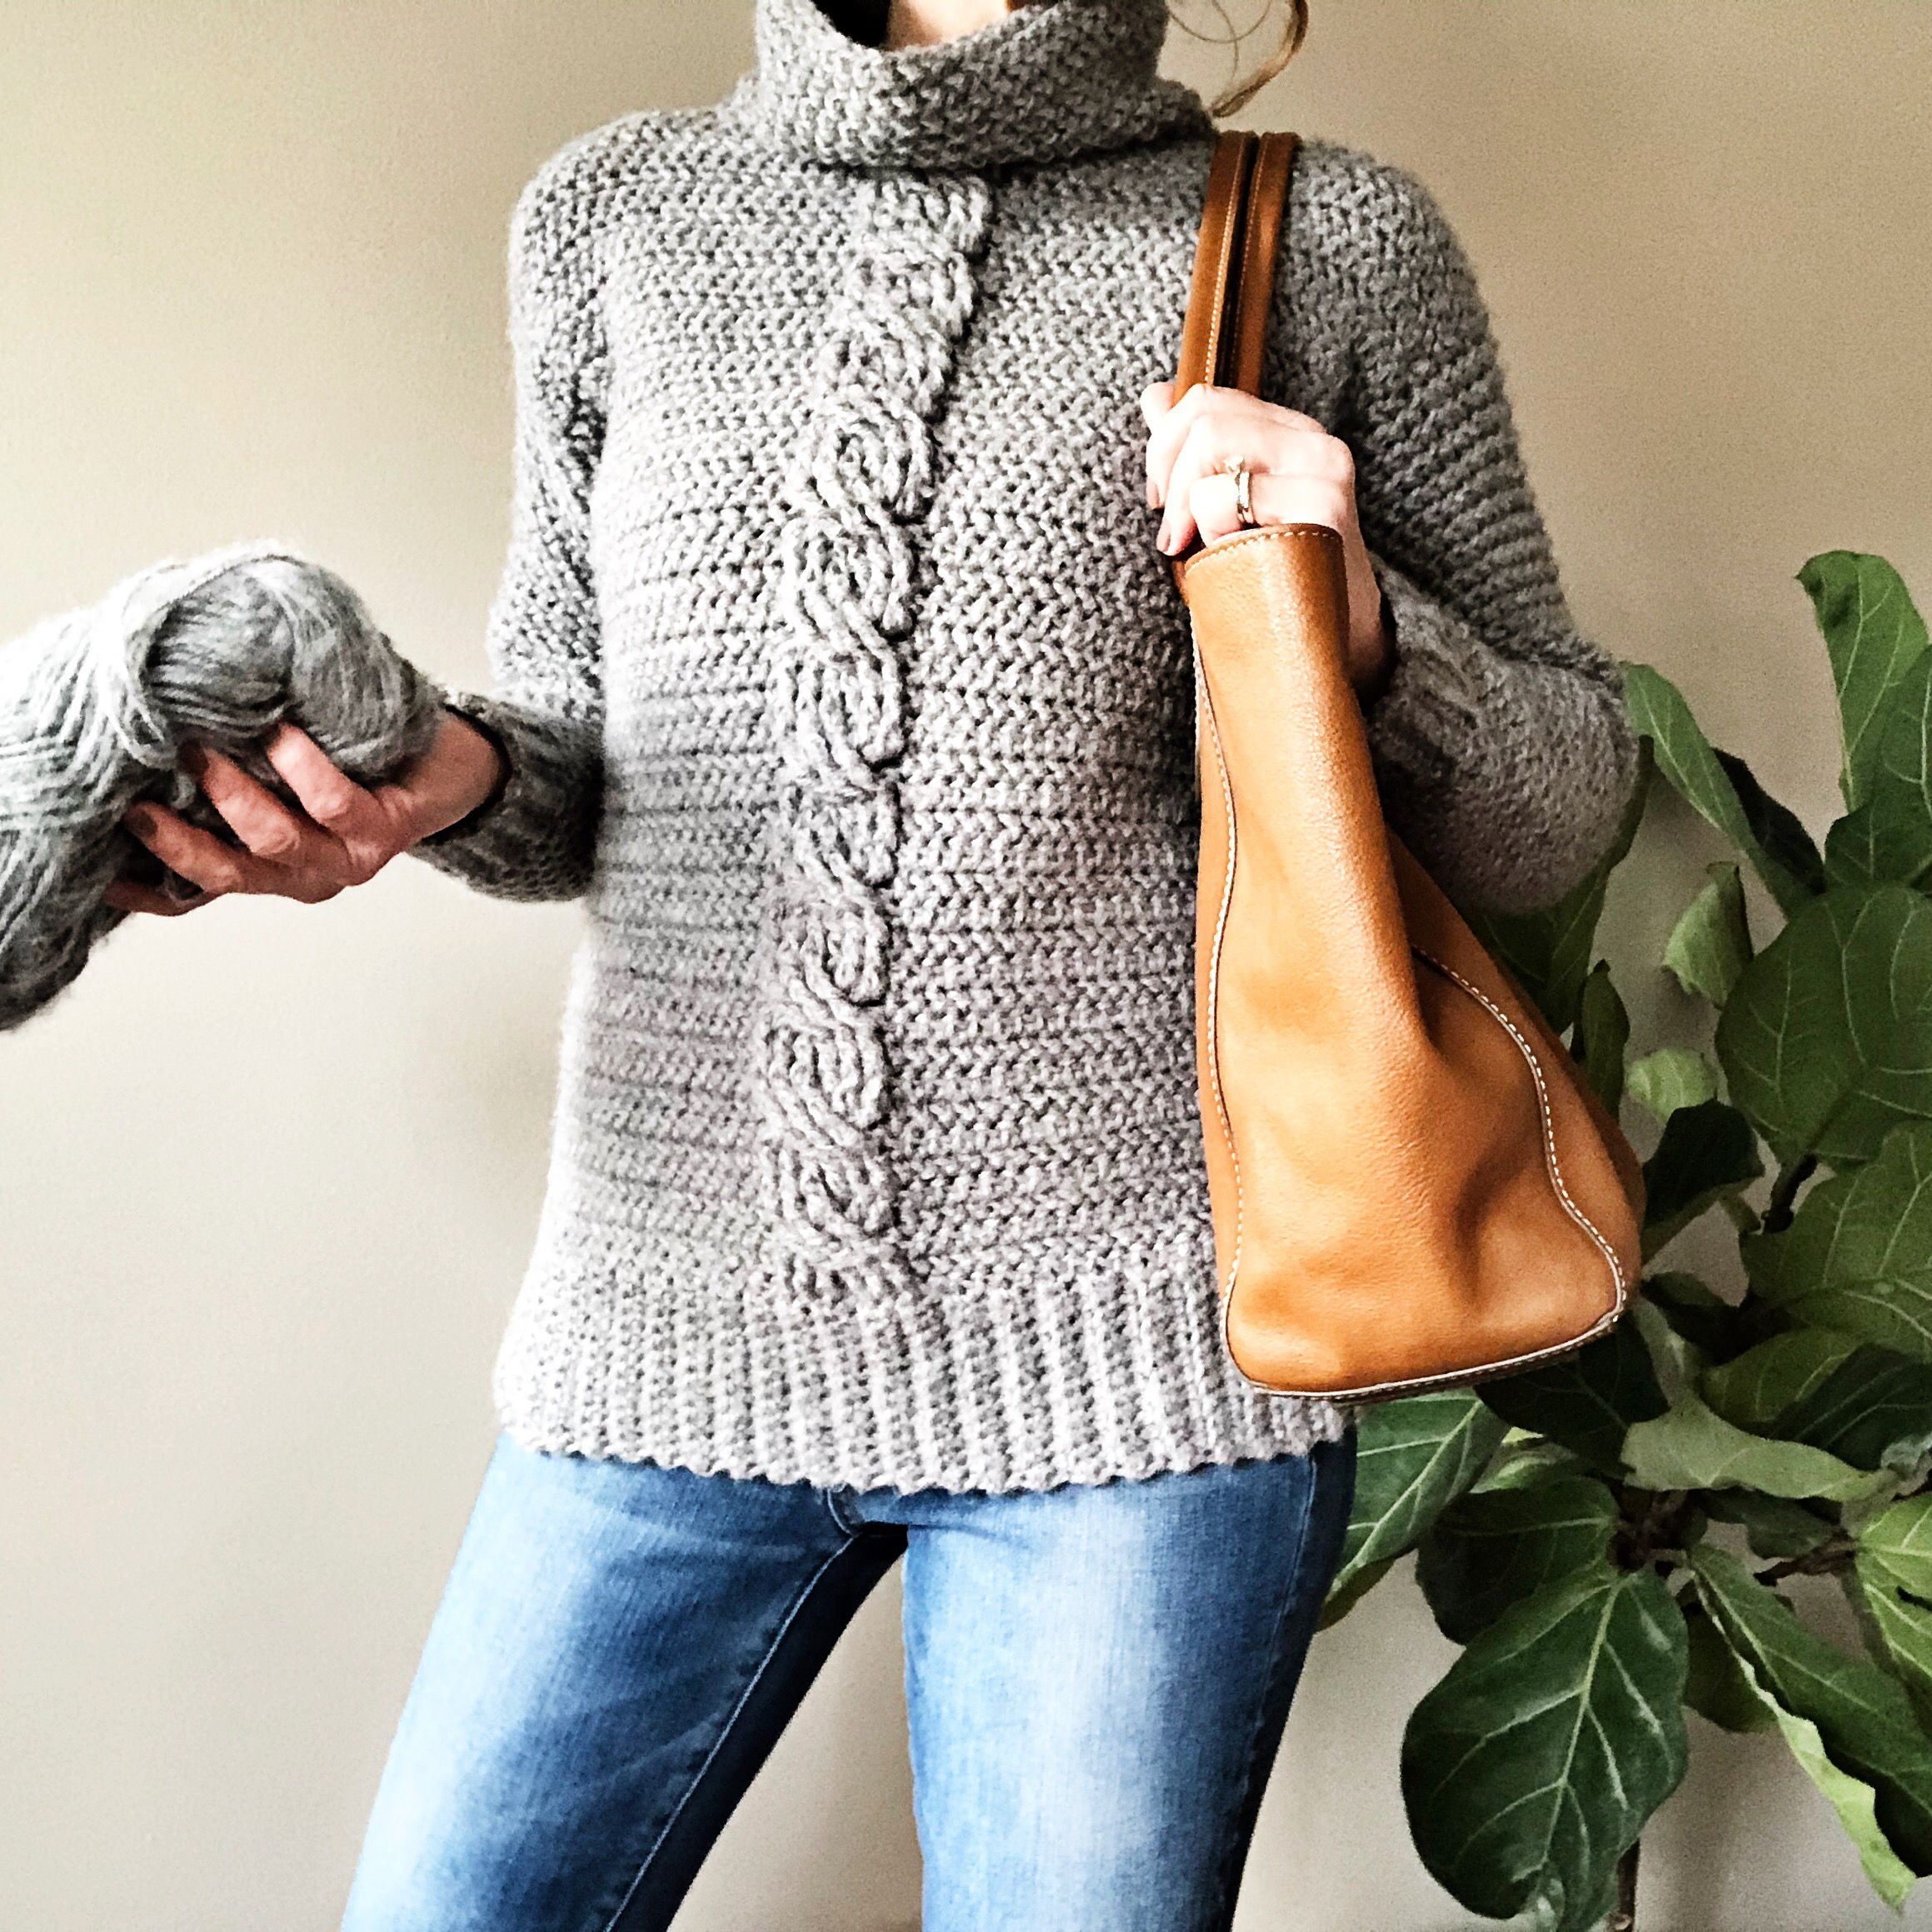 Crochet Pattern The Ashlyn Cabled Sweater Pattern Crochet Etsy In 2020 Cable Sweater Pattern Sweater Crochet Pattern Sweater Pattern